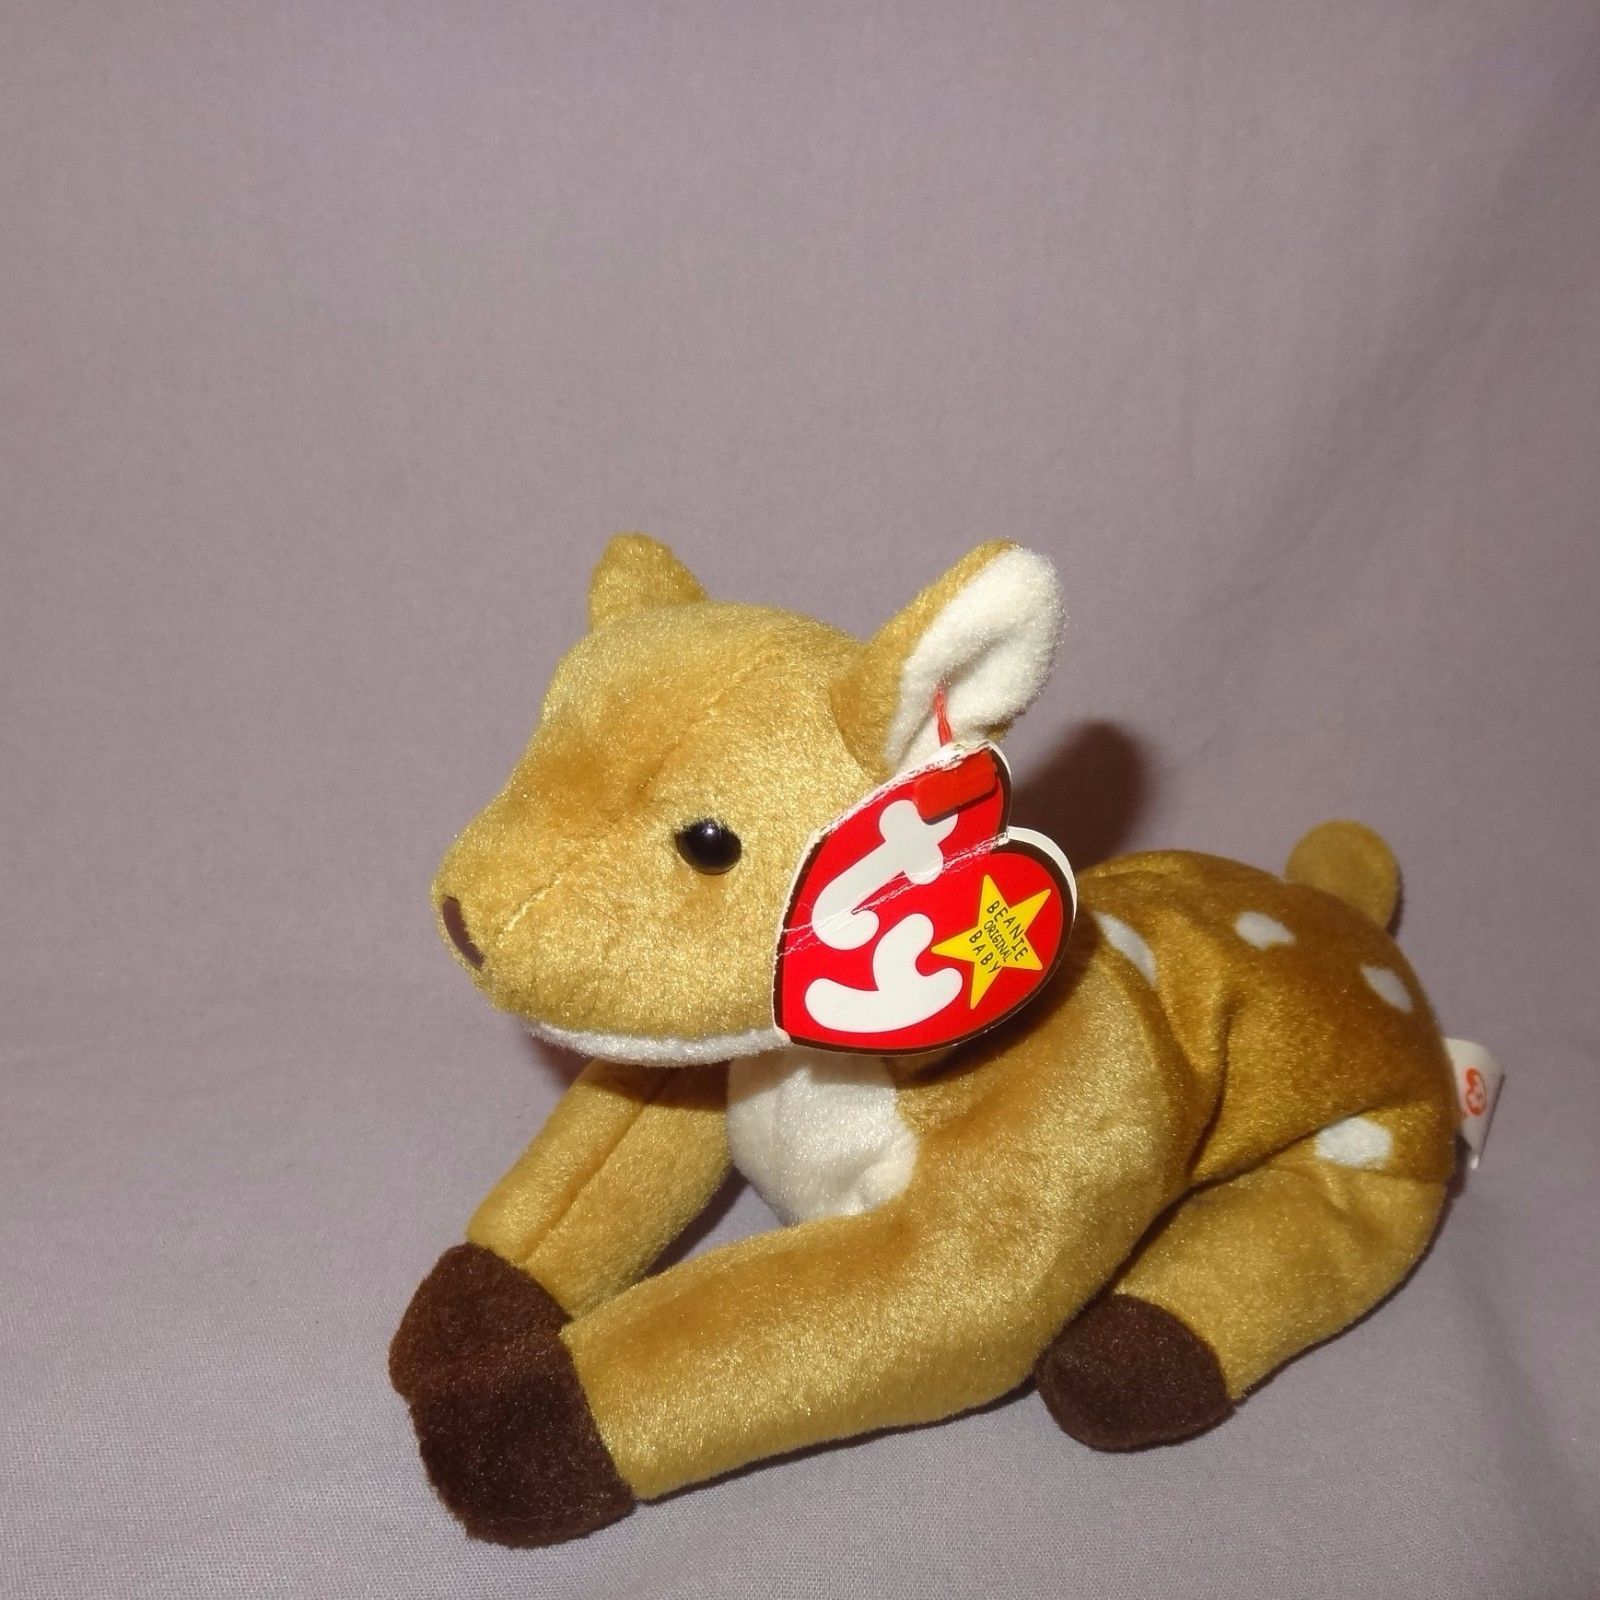 "Whisper Deer Fawn Ty Beanie Baby Plush Stuffed Animal Toy 1997 Tush tag 1998 4"""